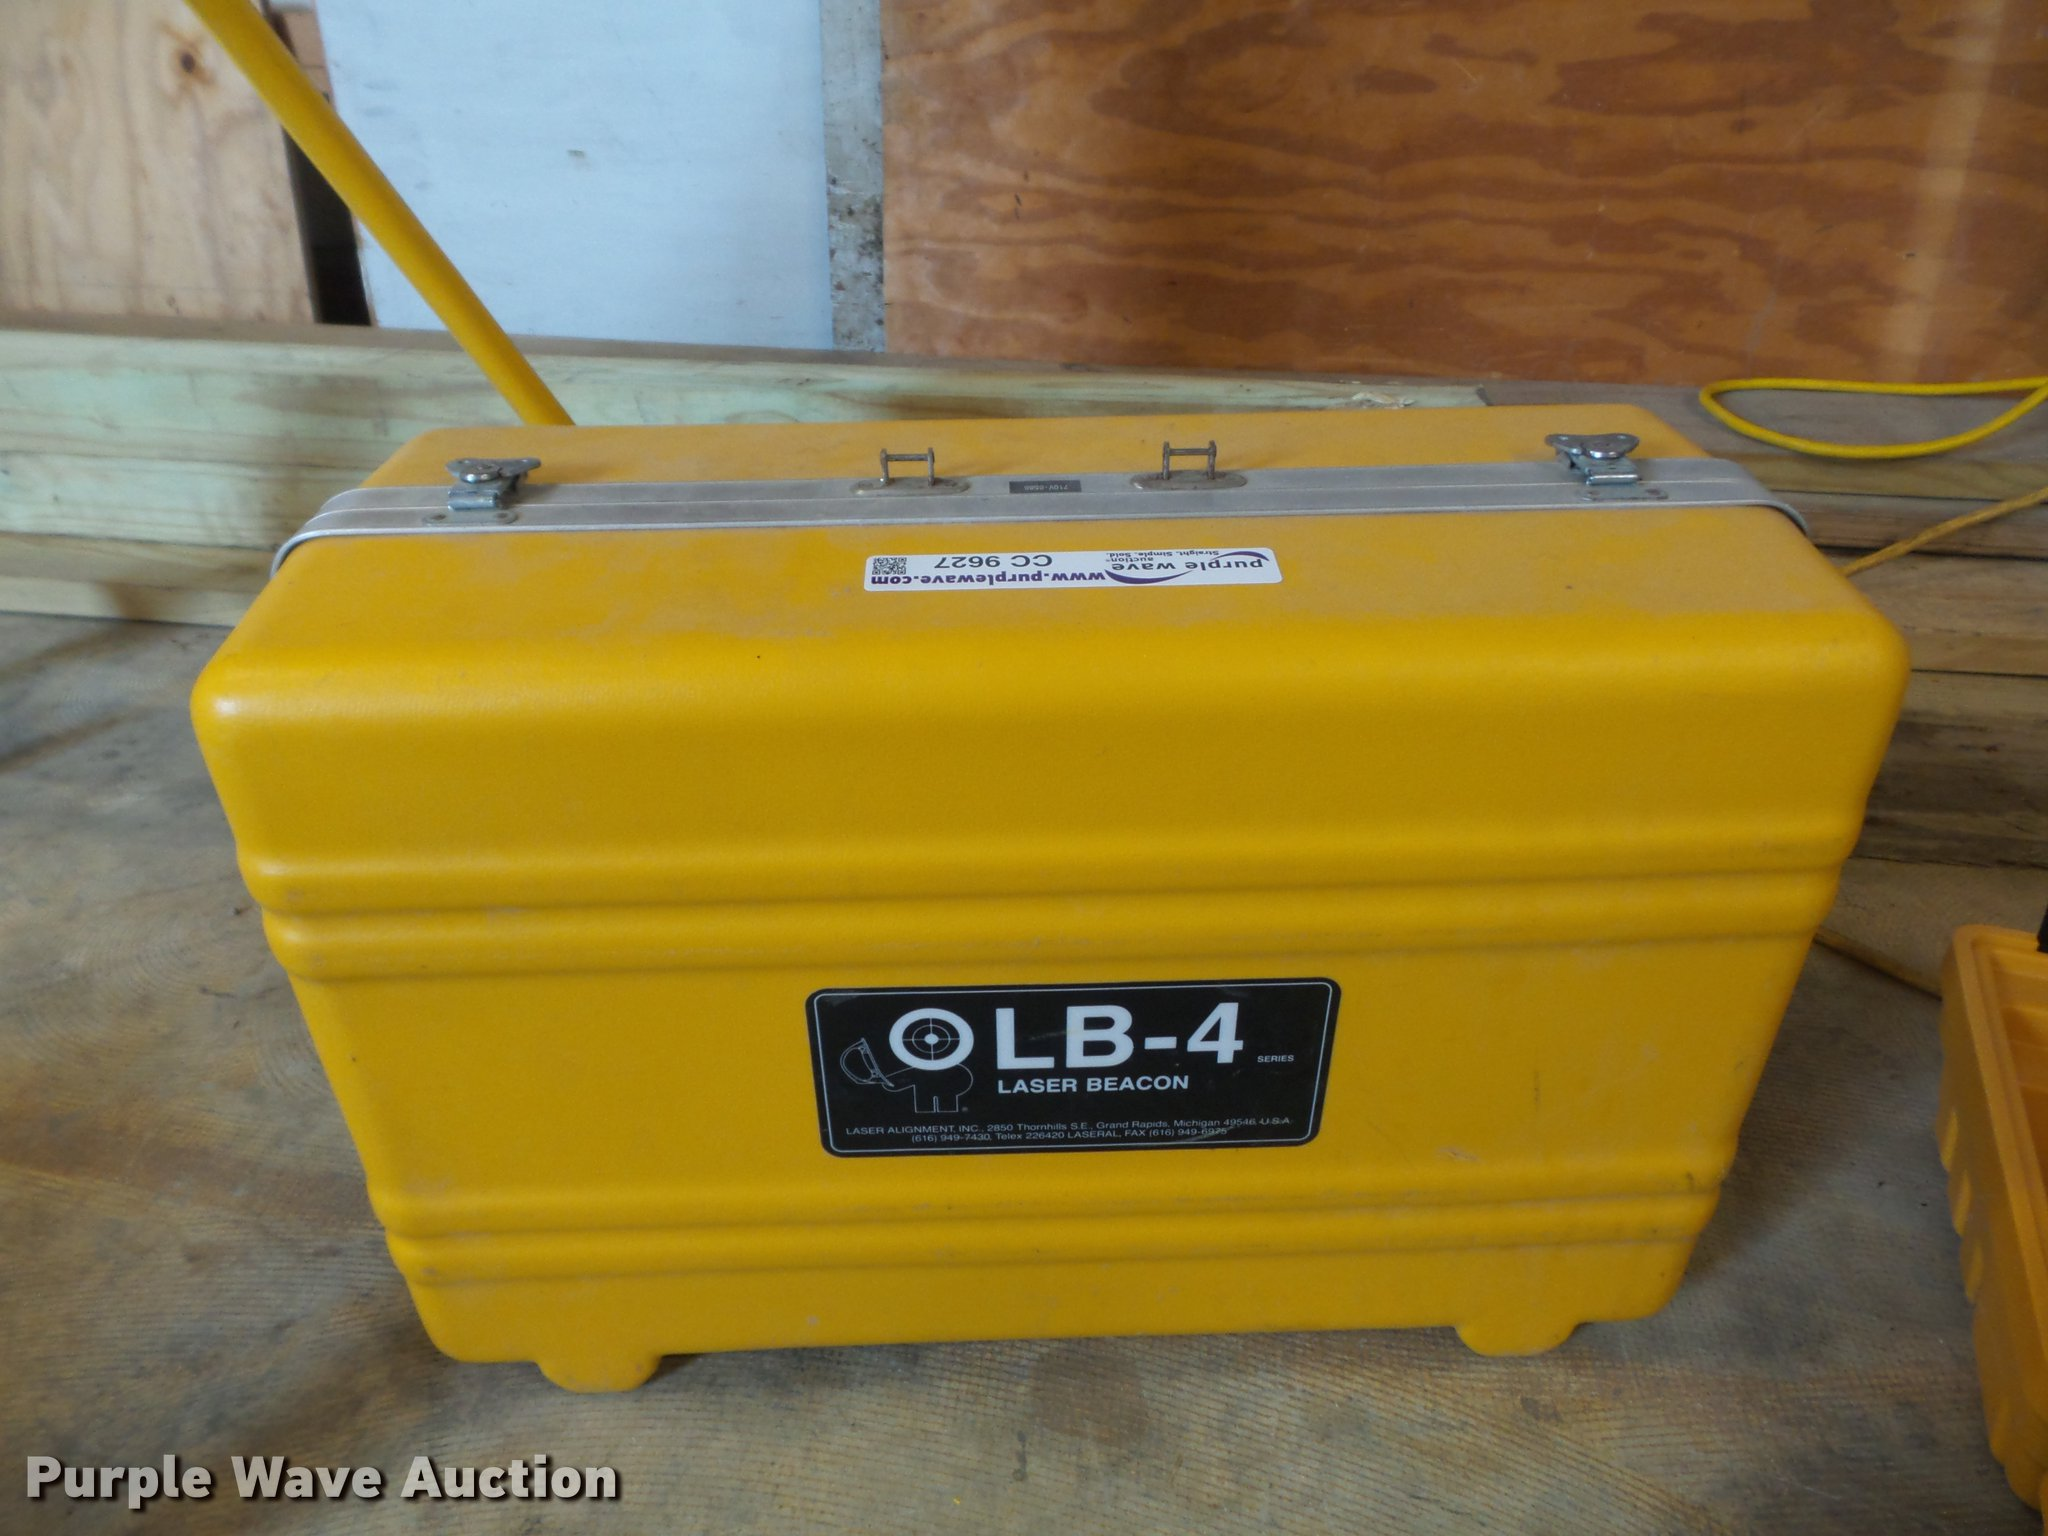 Surveying Equipment Item Cc9627 Sold October 26